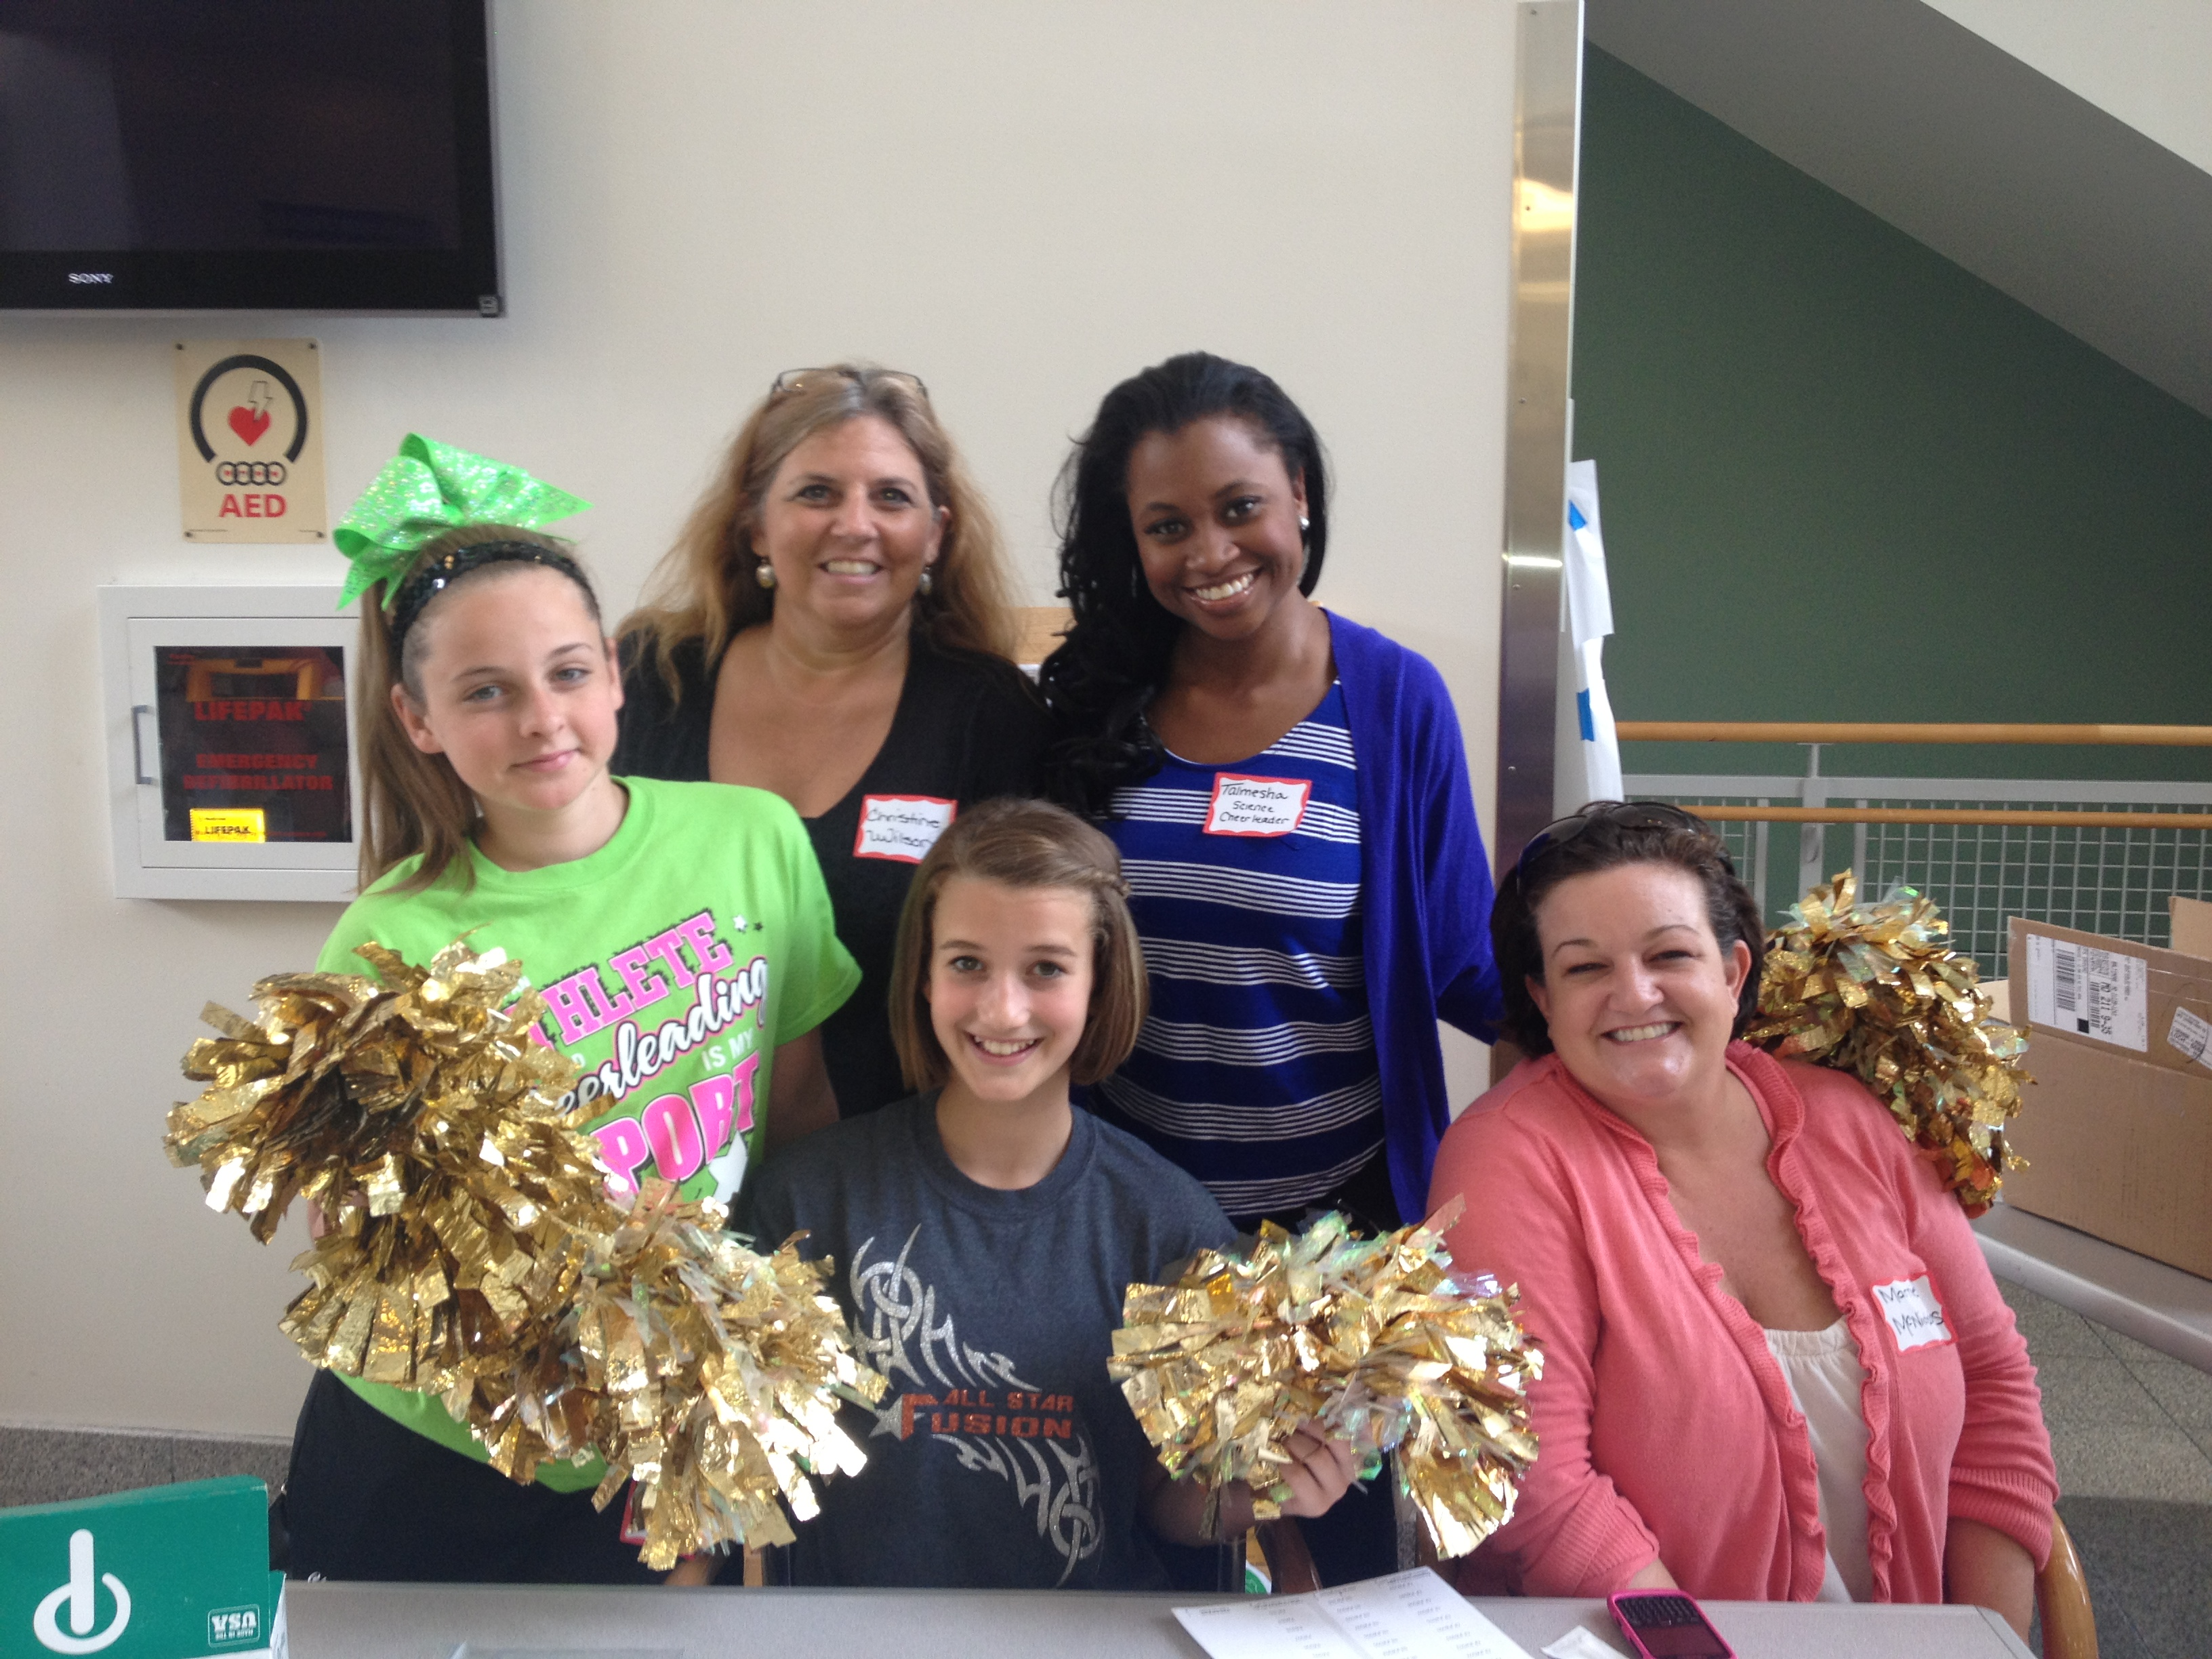 Guest post from Science Cheerleader Talmesha and Junior Science Cheerleaders!